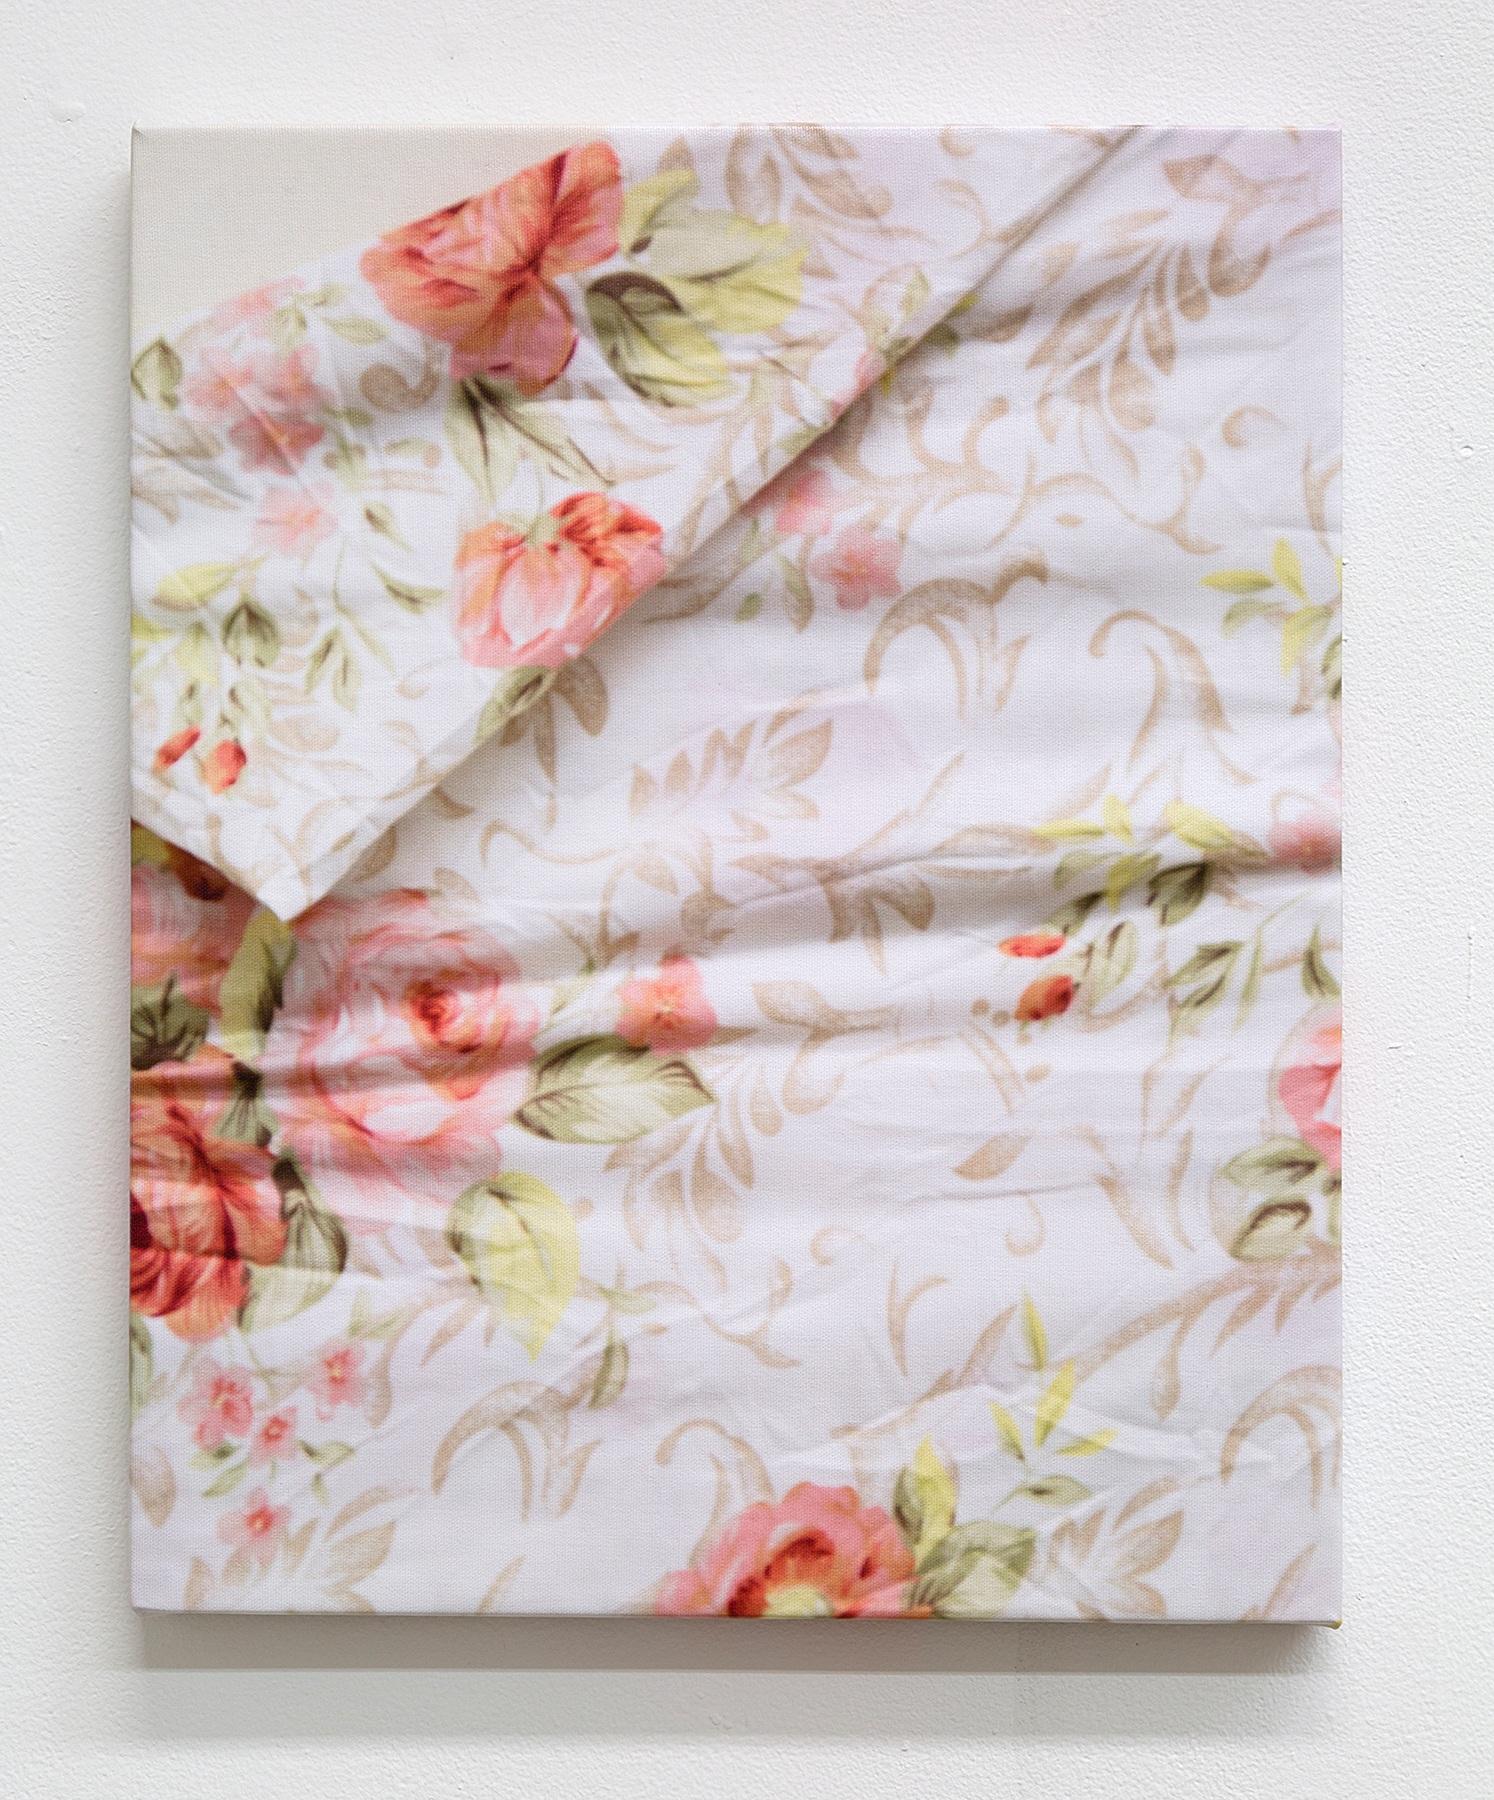 fabric work1.jpg